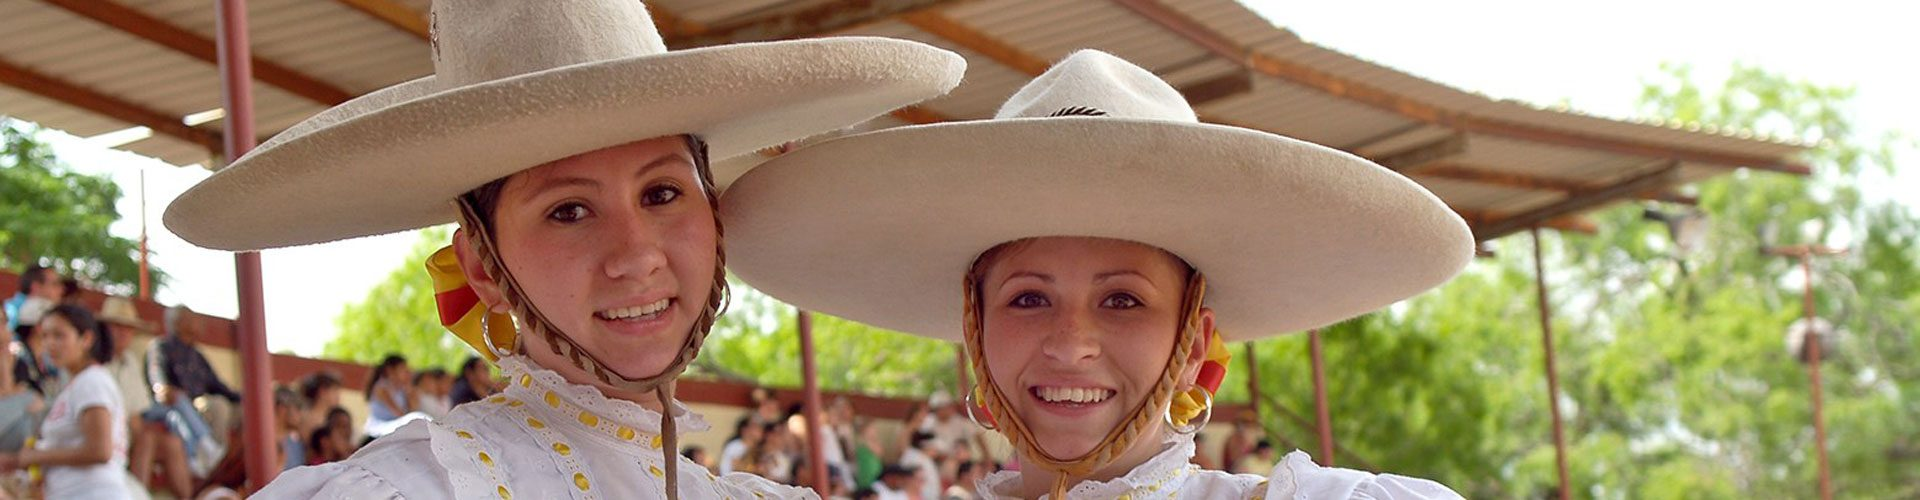 Mexican Rodeo, San Antonio. Texas